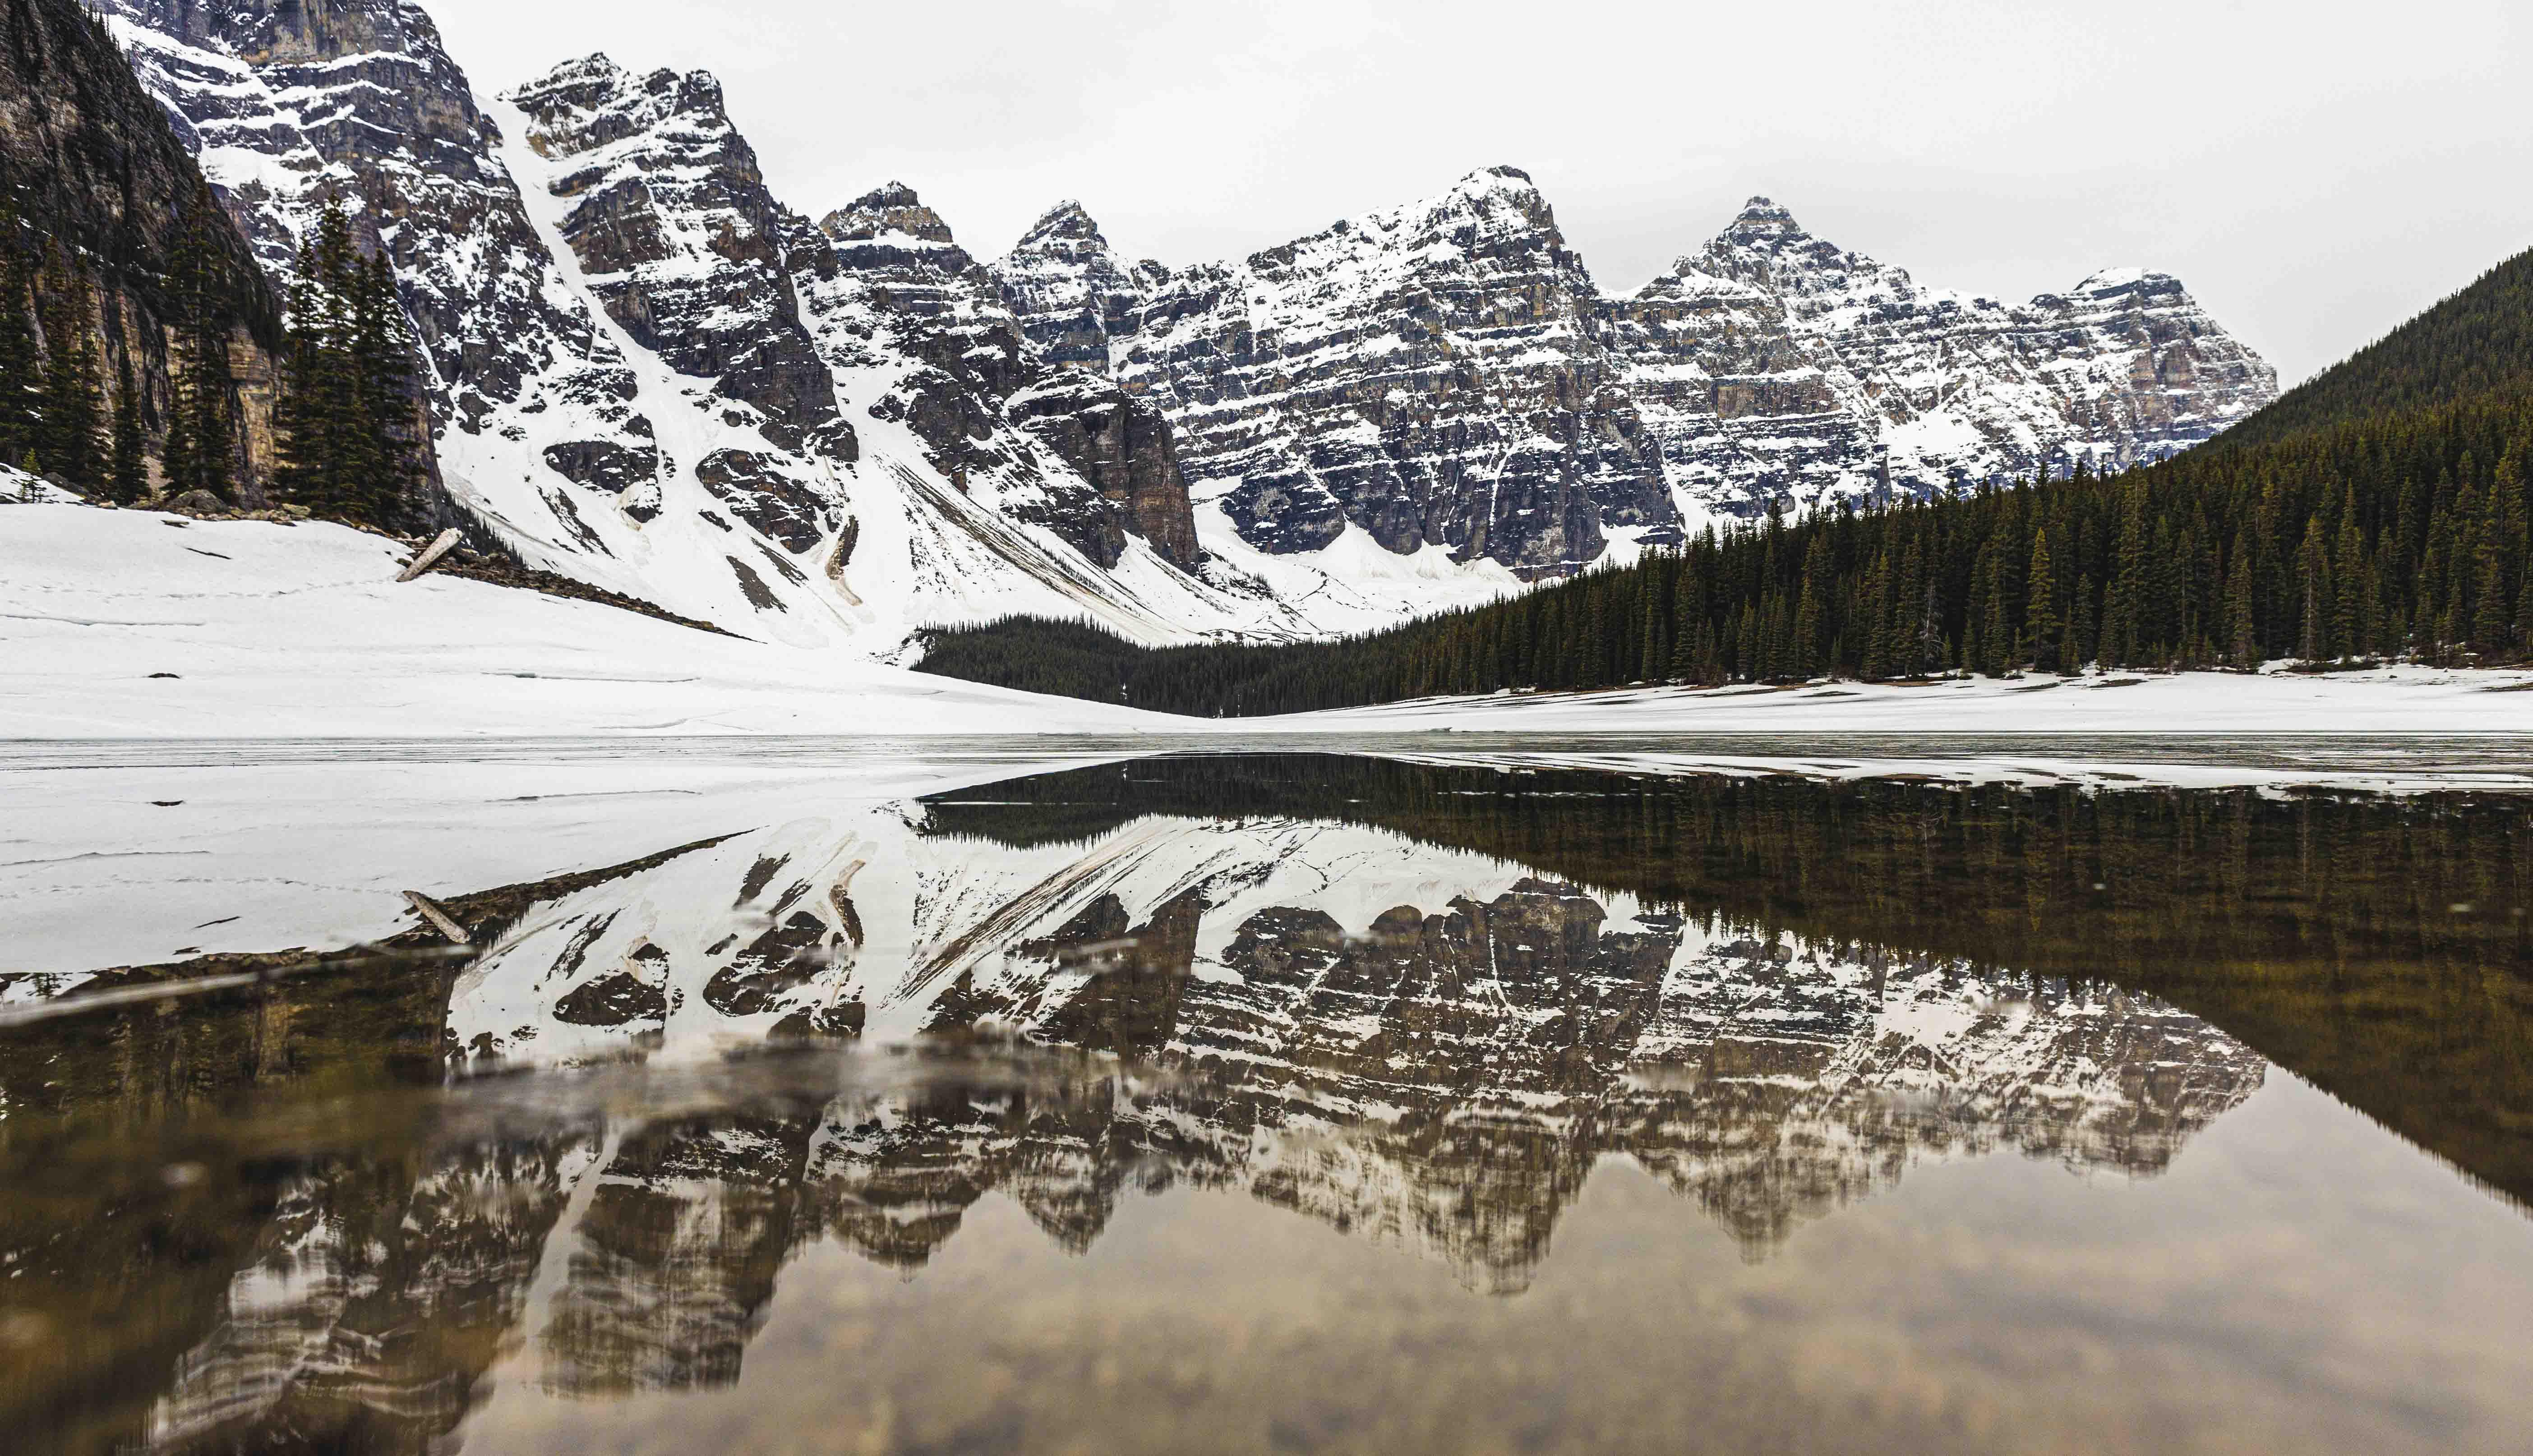 Moraine_Lake_Reflection_Canada_Banff-1_Cloudberryphotography